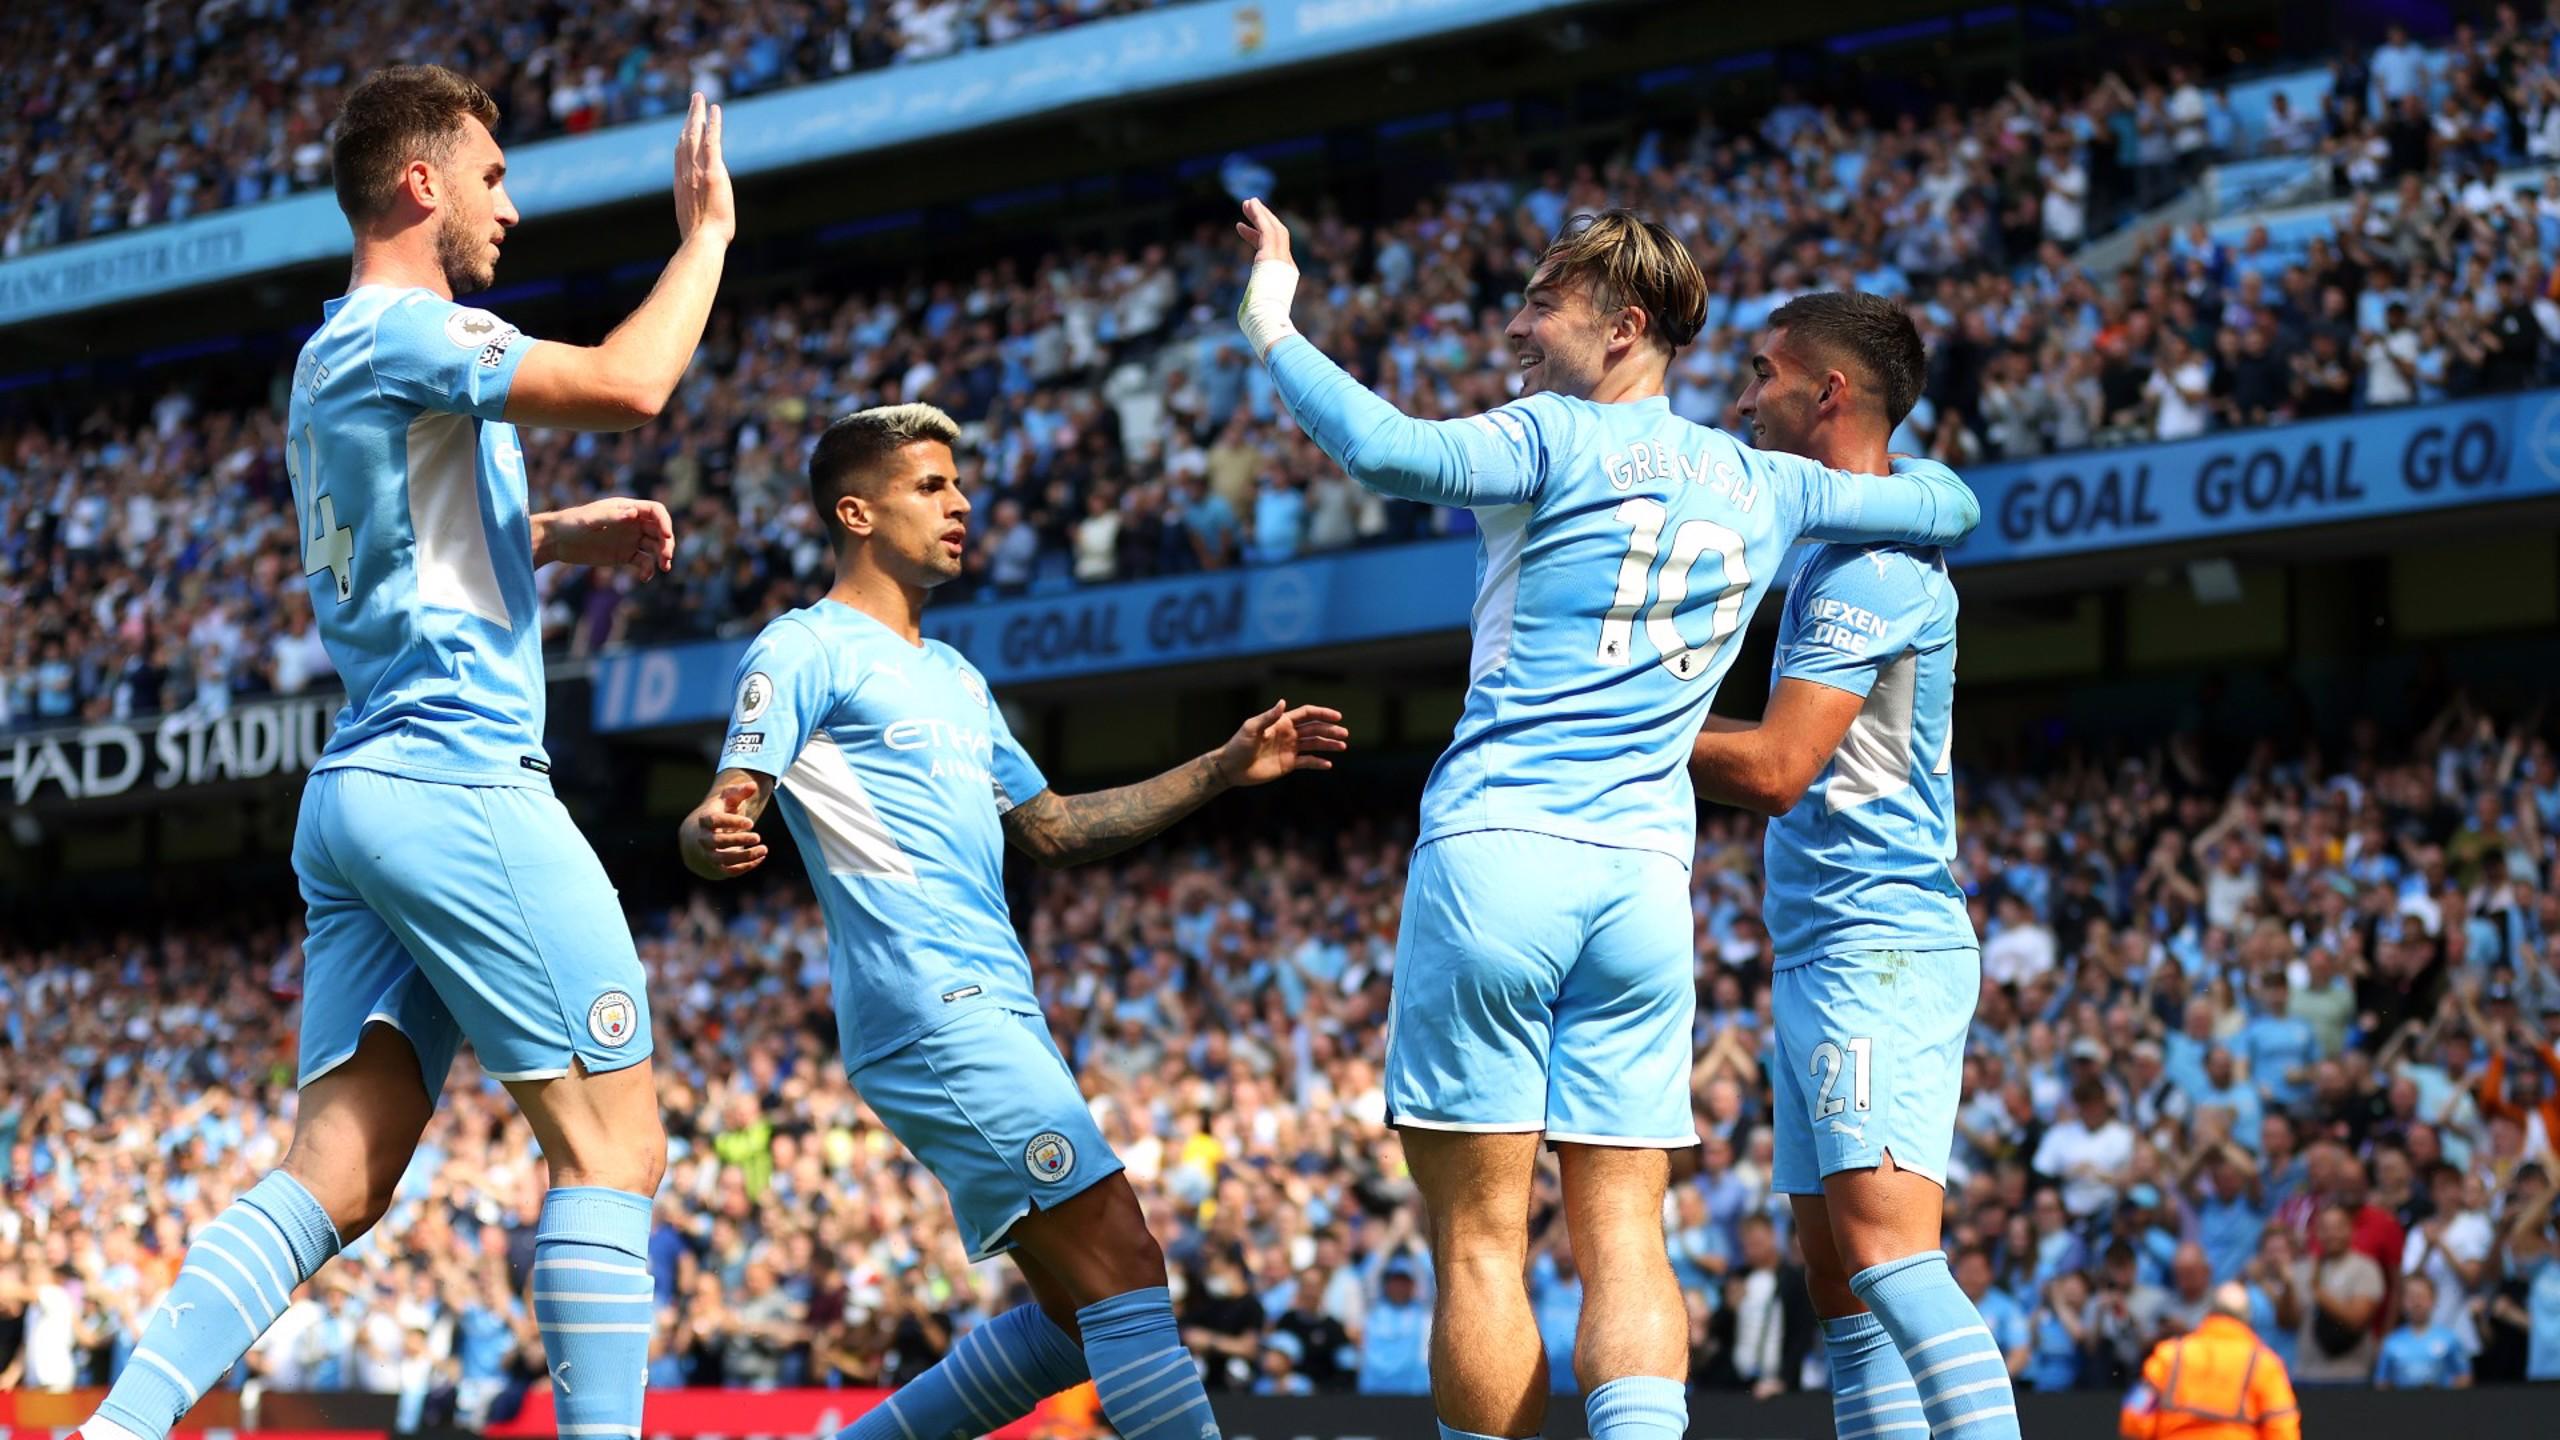 City hit five again as 10-man Gunners thrashed